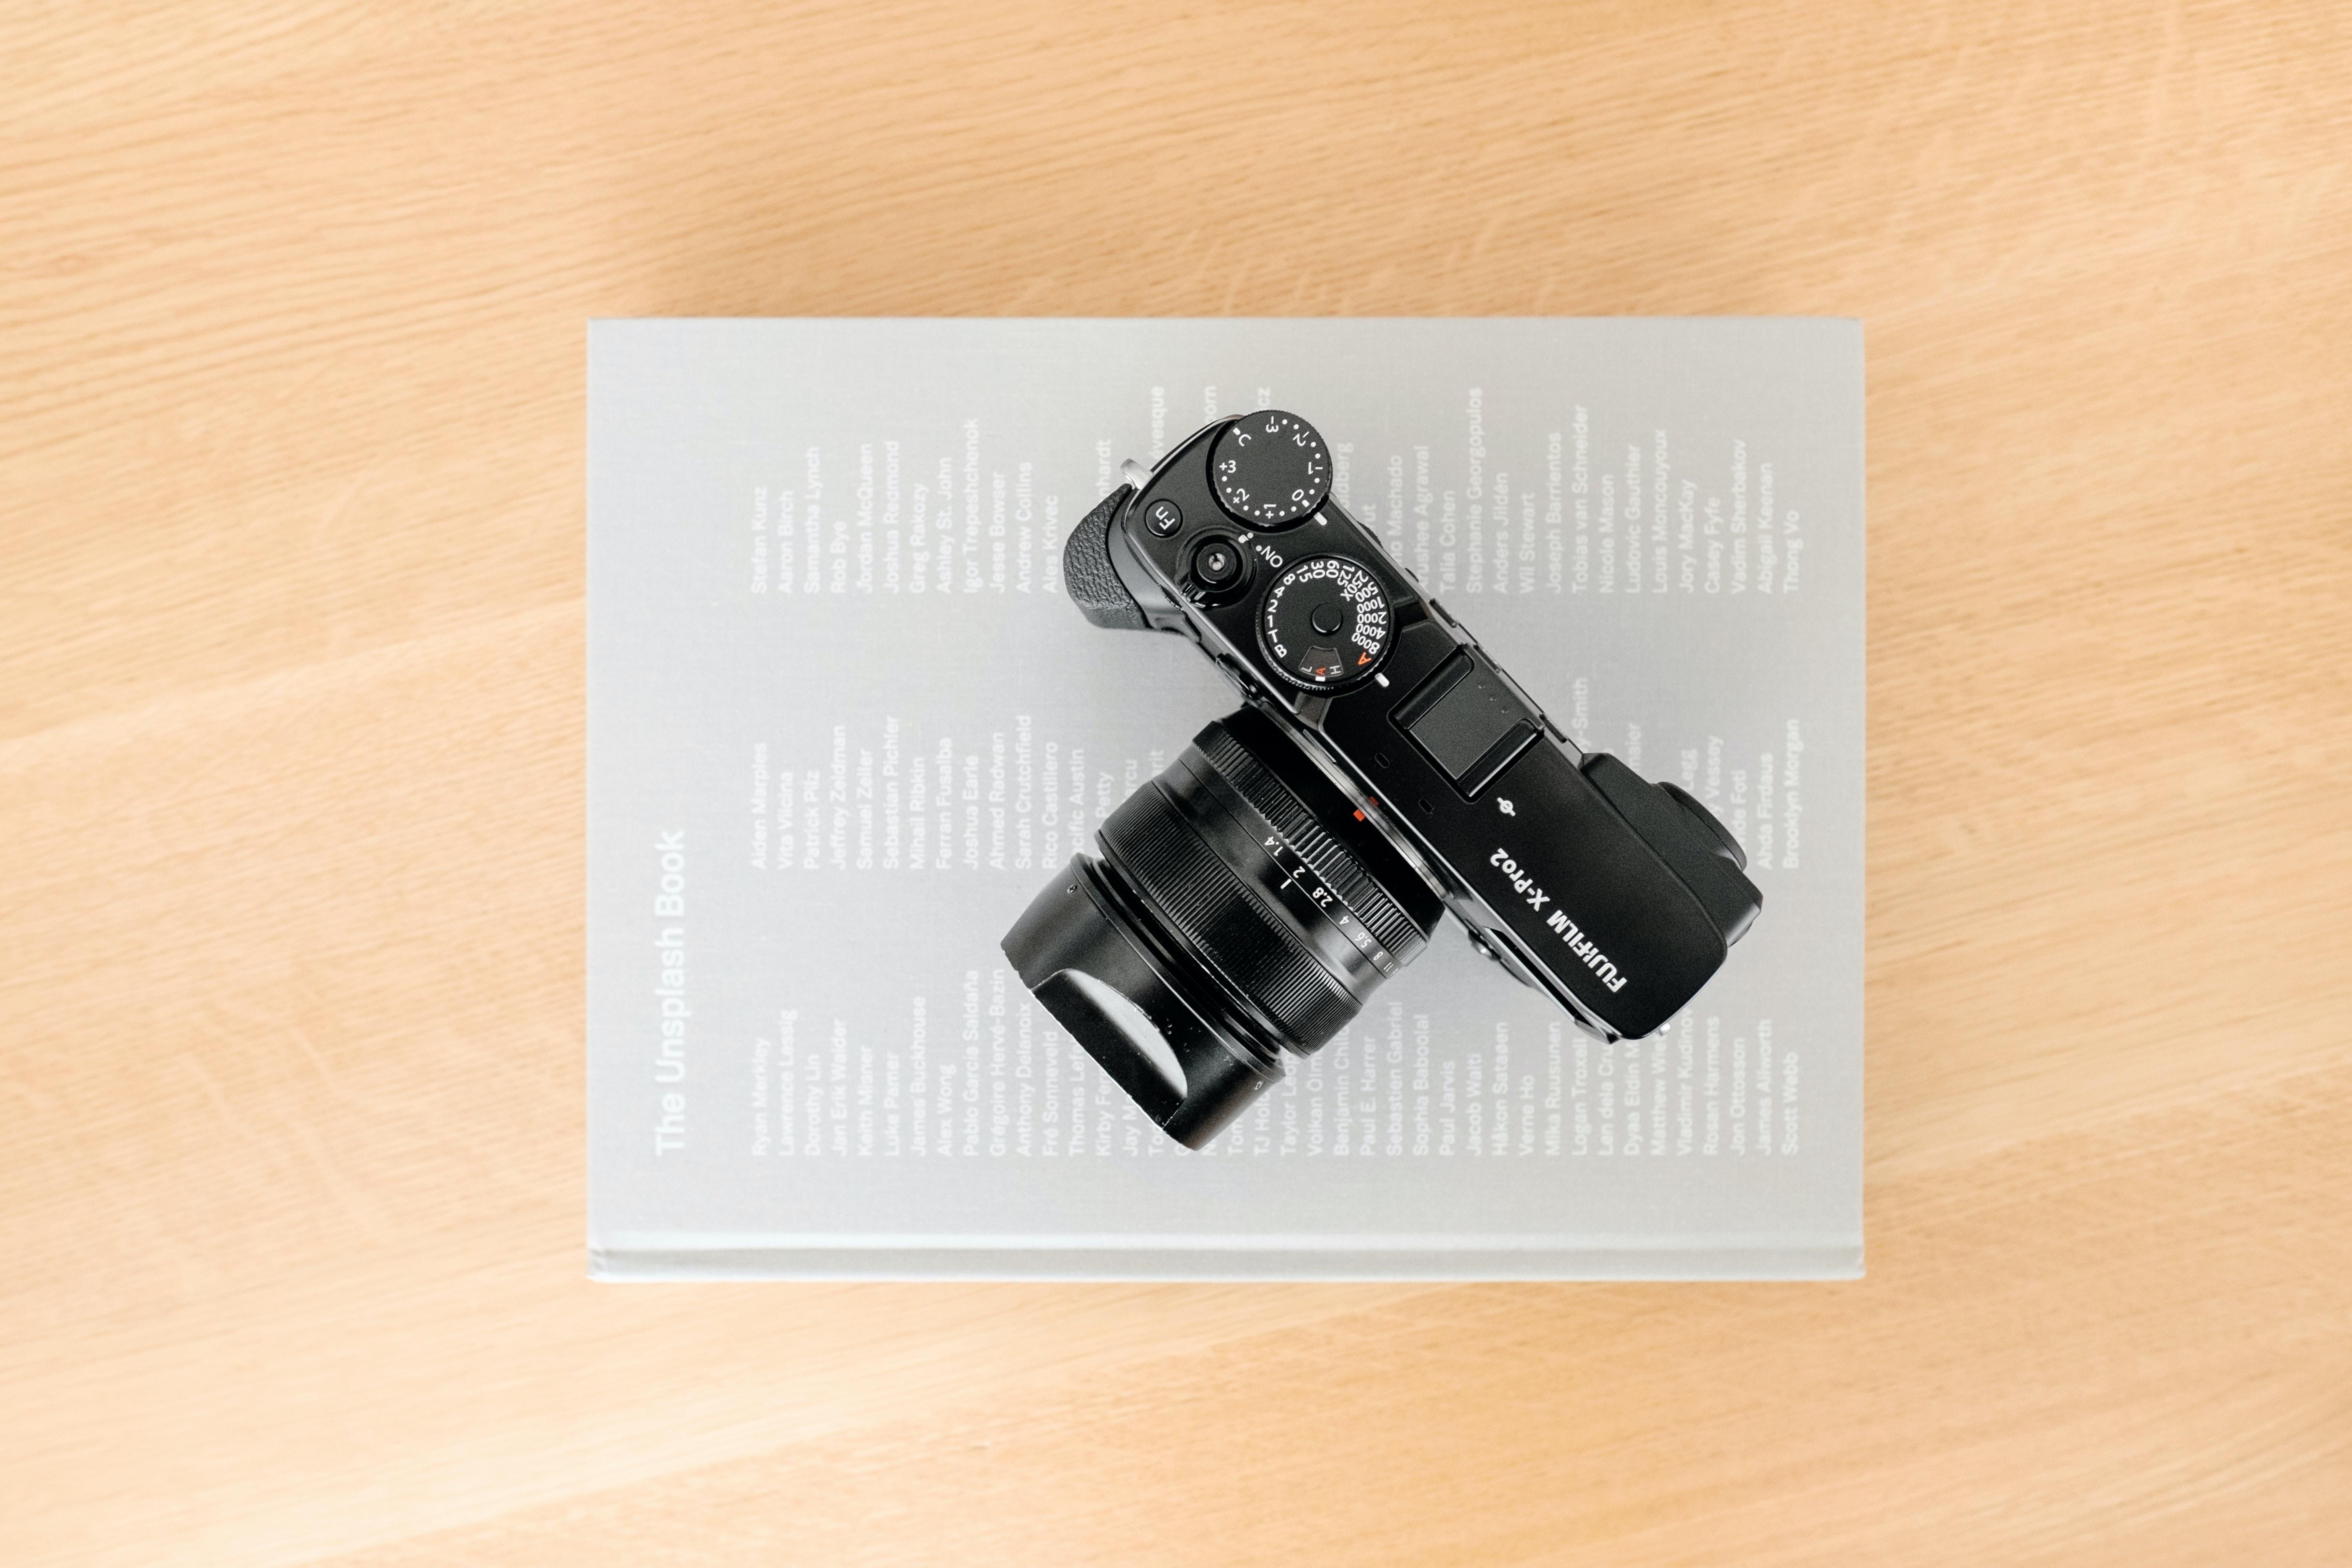 black DSLR camera on gray book